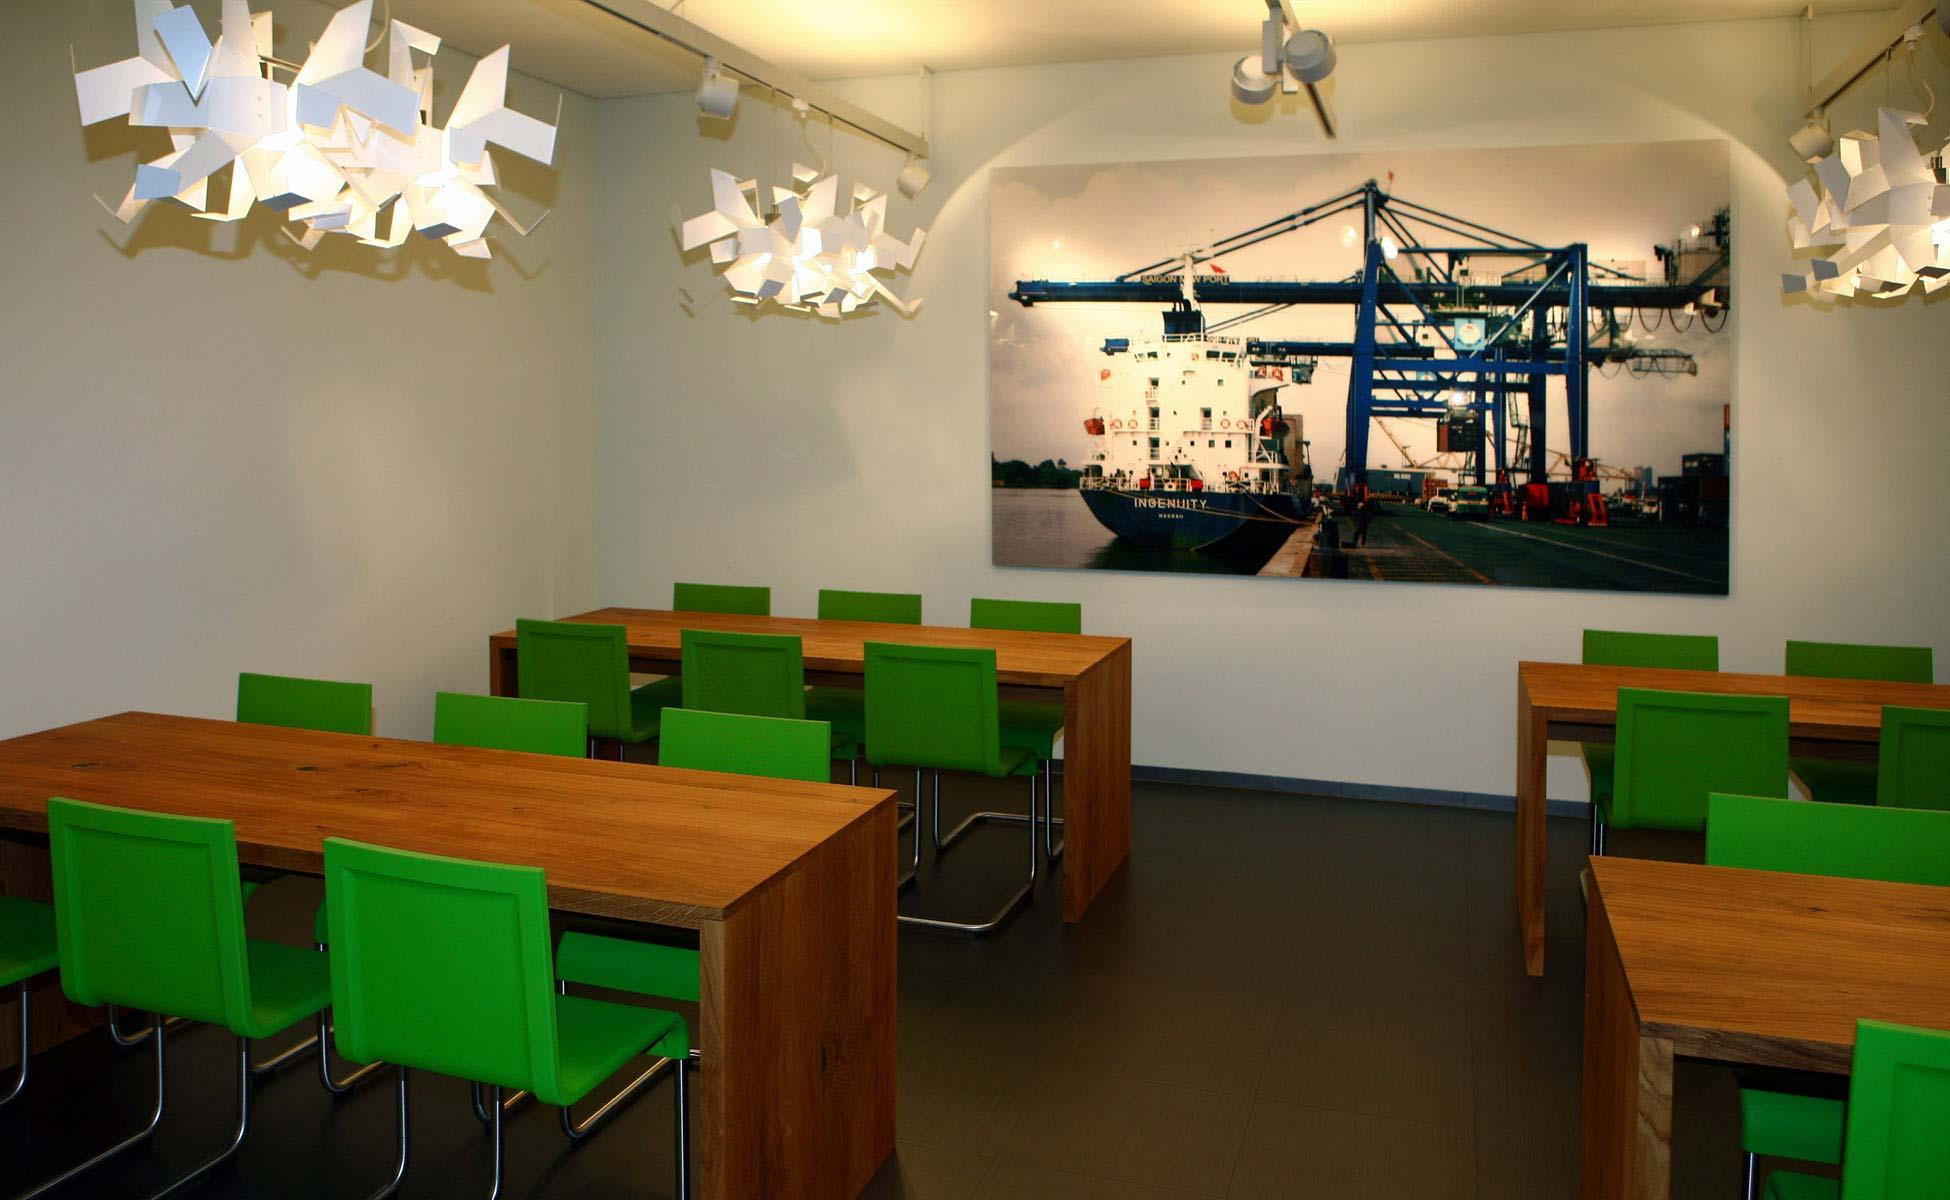 e15 tische vitra .04 cafeteria bei steidten+ berlin